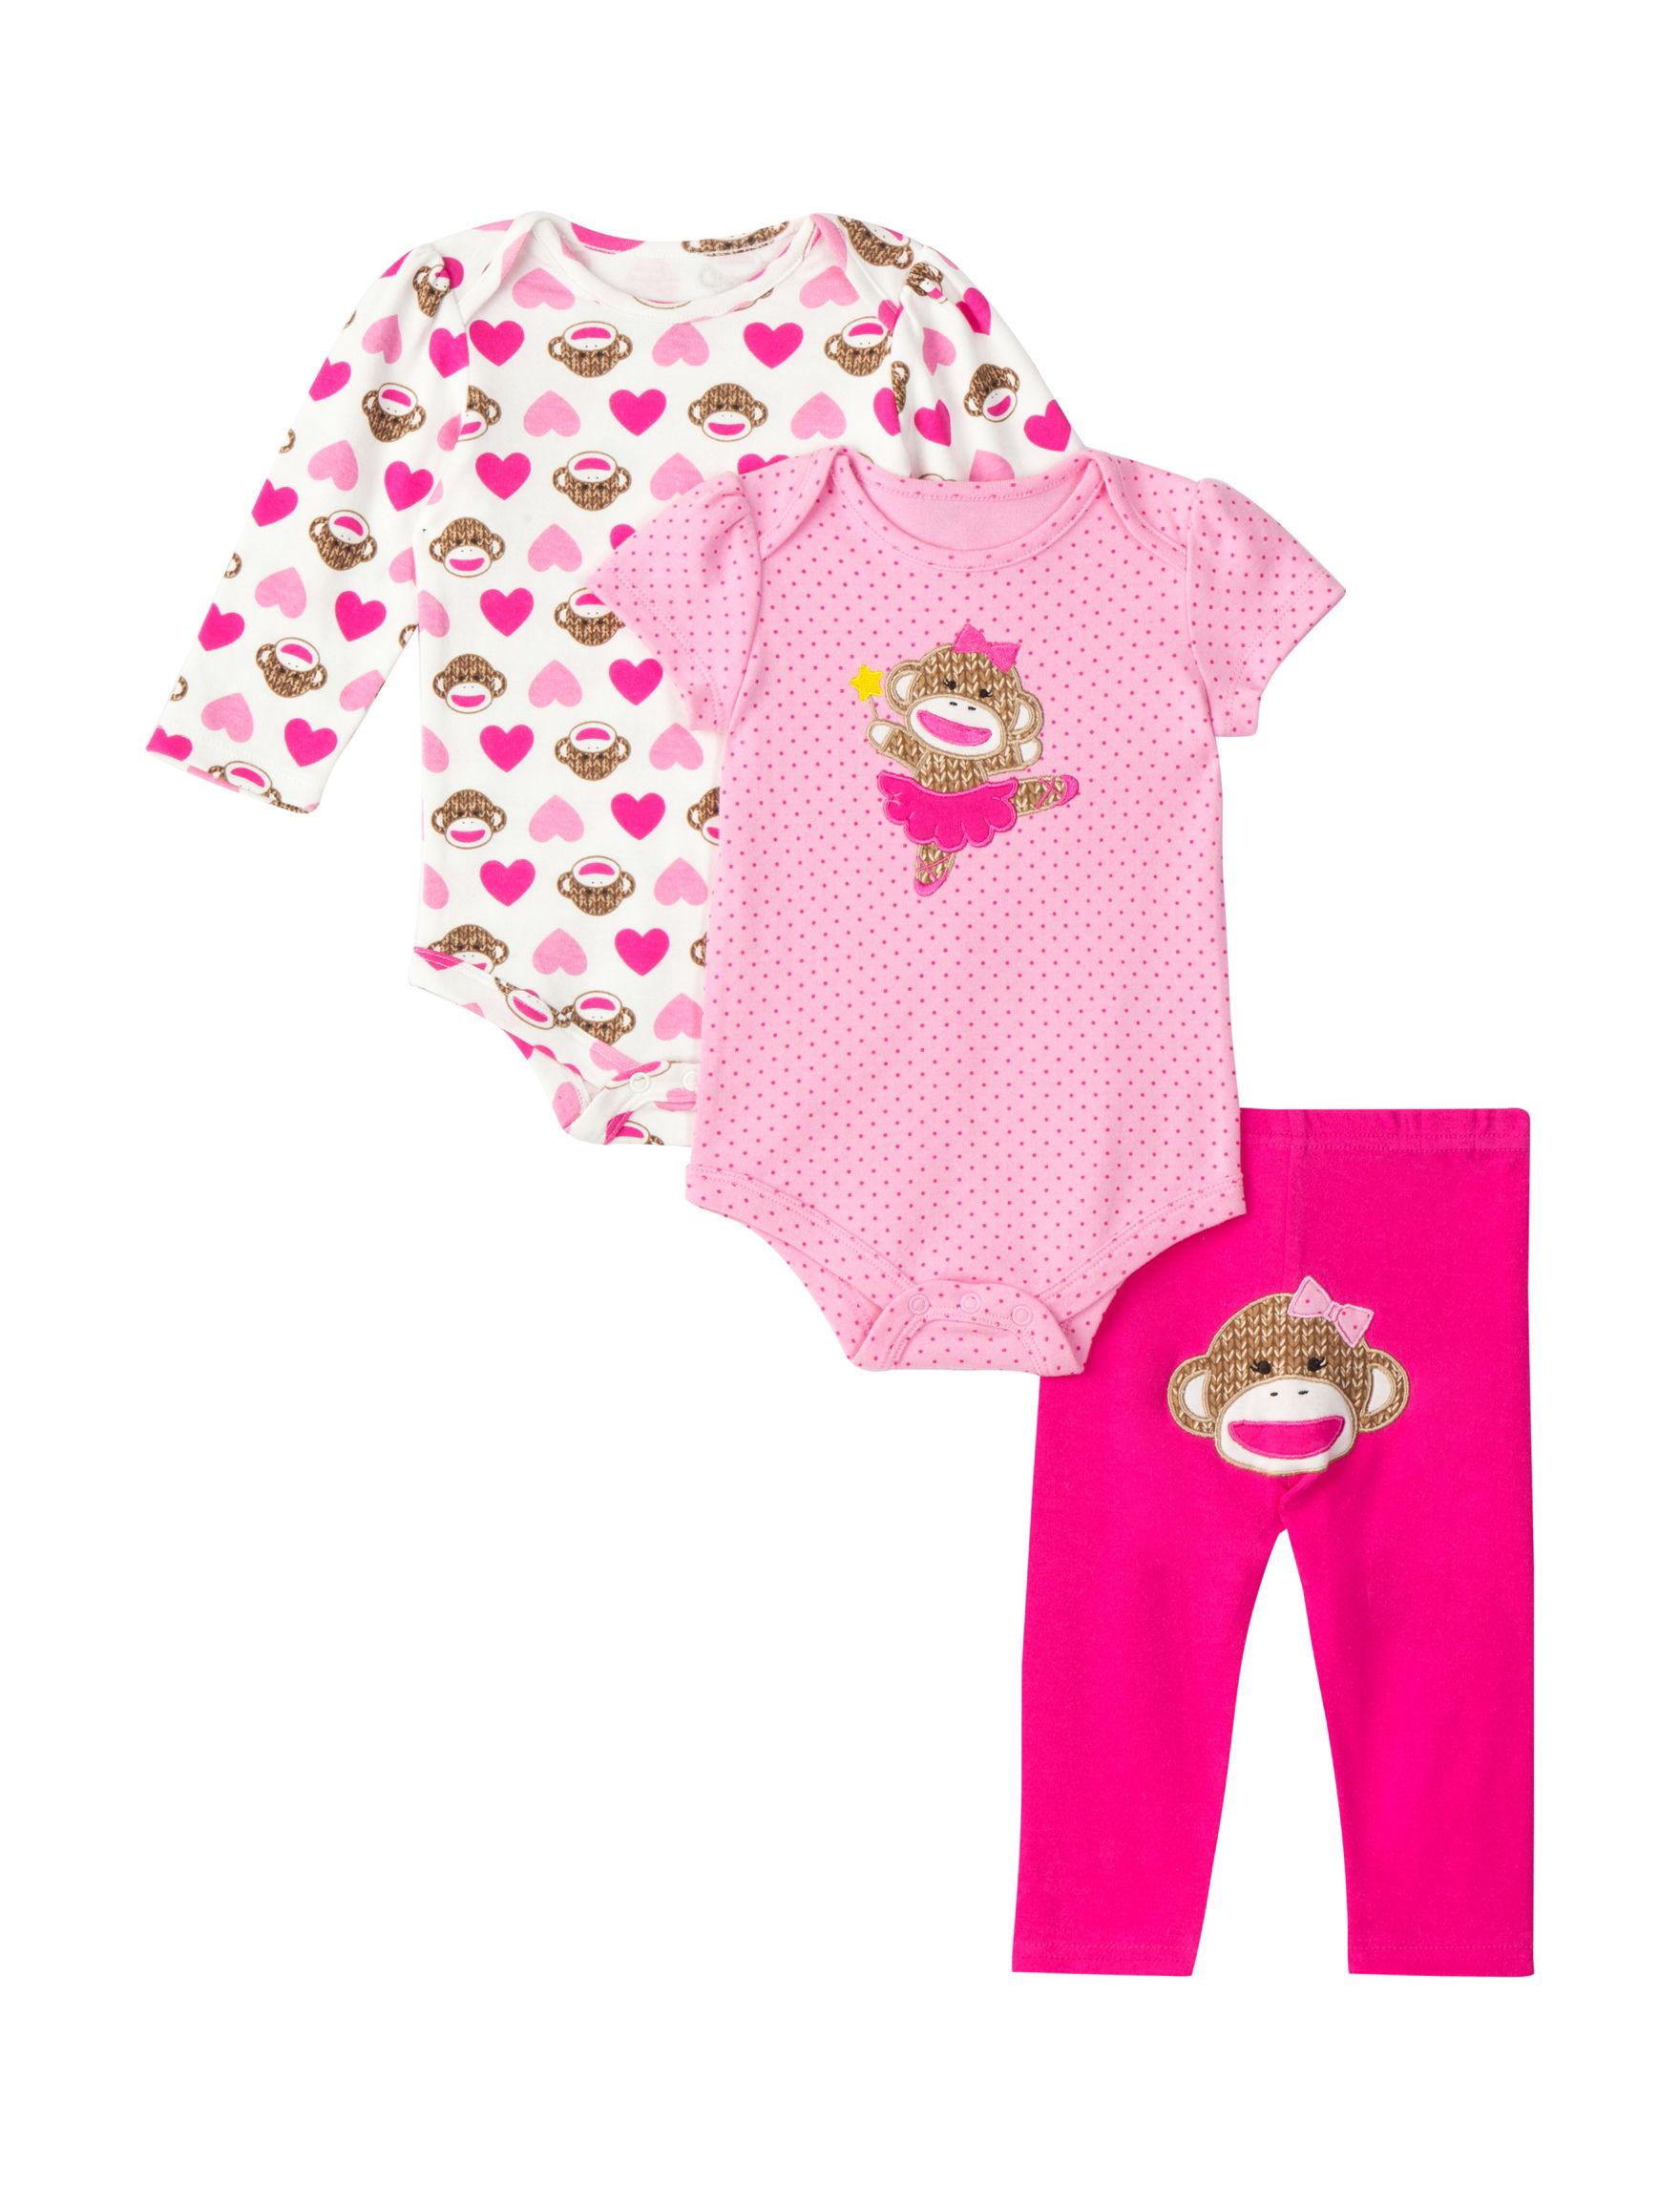 Baby Starters 3 pc Sock Monkey Bodysuit Set – Baby 3 12 Mos